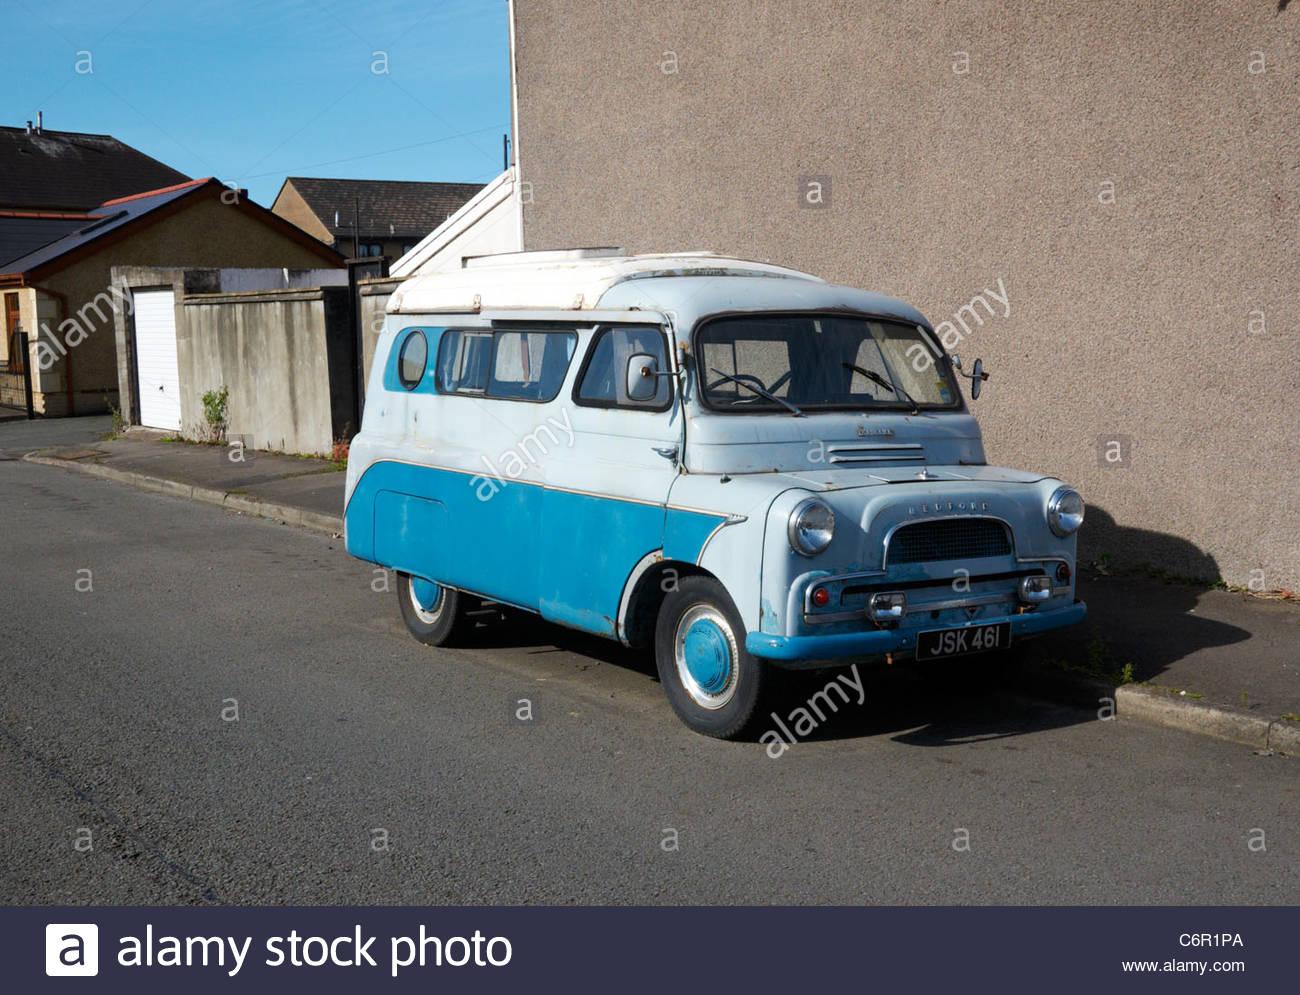 two tone blue mid 1960s bedford ca camper van - Stock Image